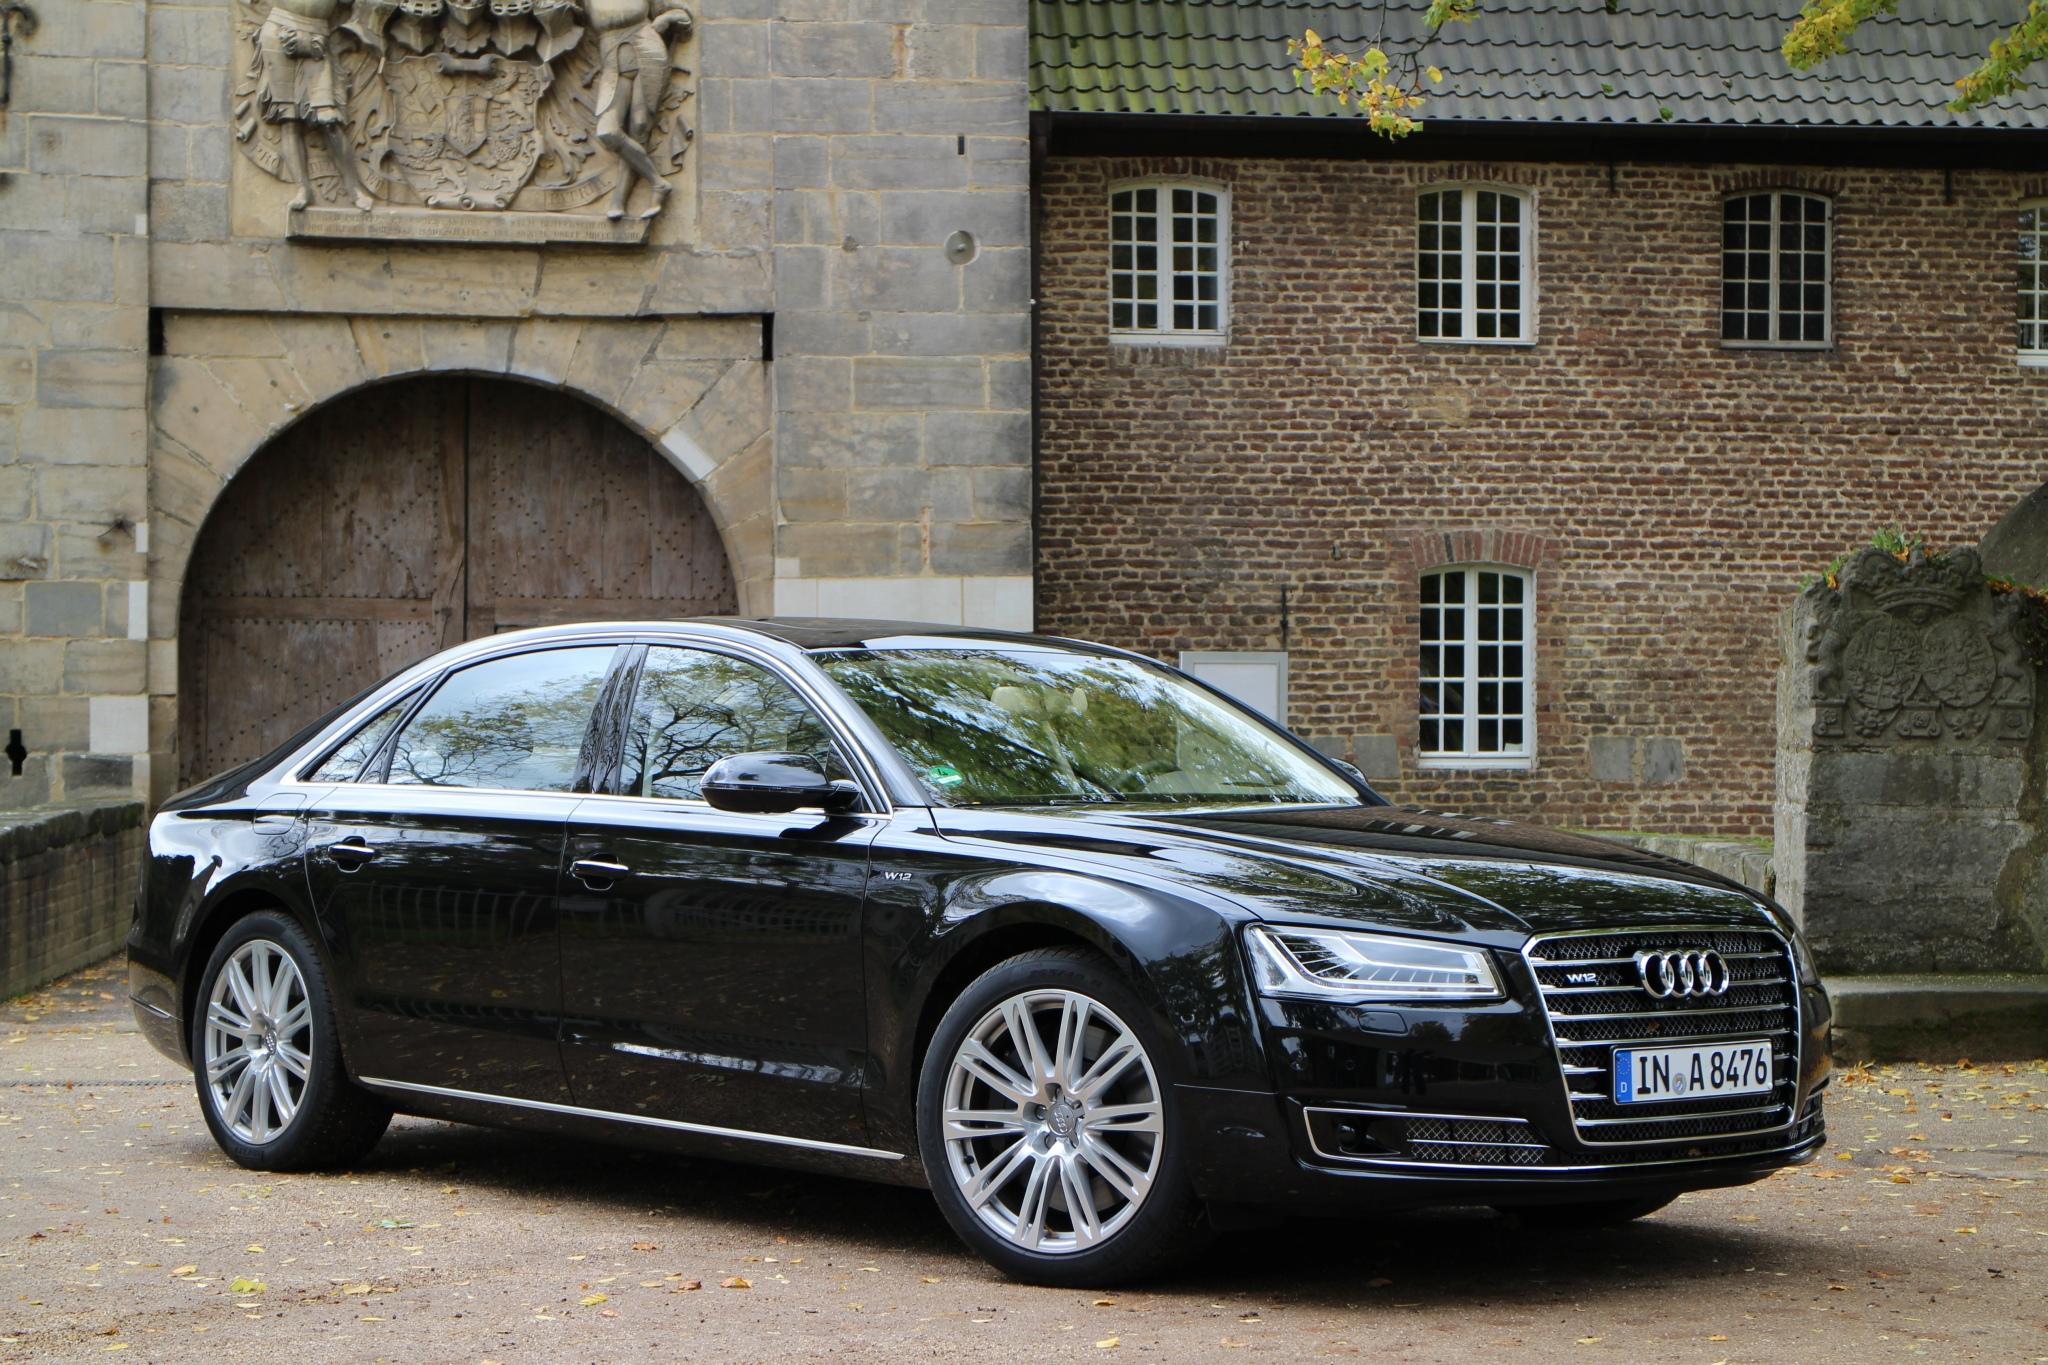 File:Audi A8 2013 (11209853445).jpg - Wikimedia Commons